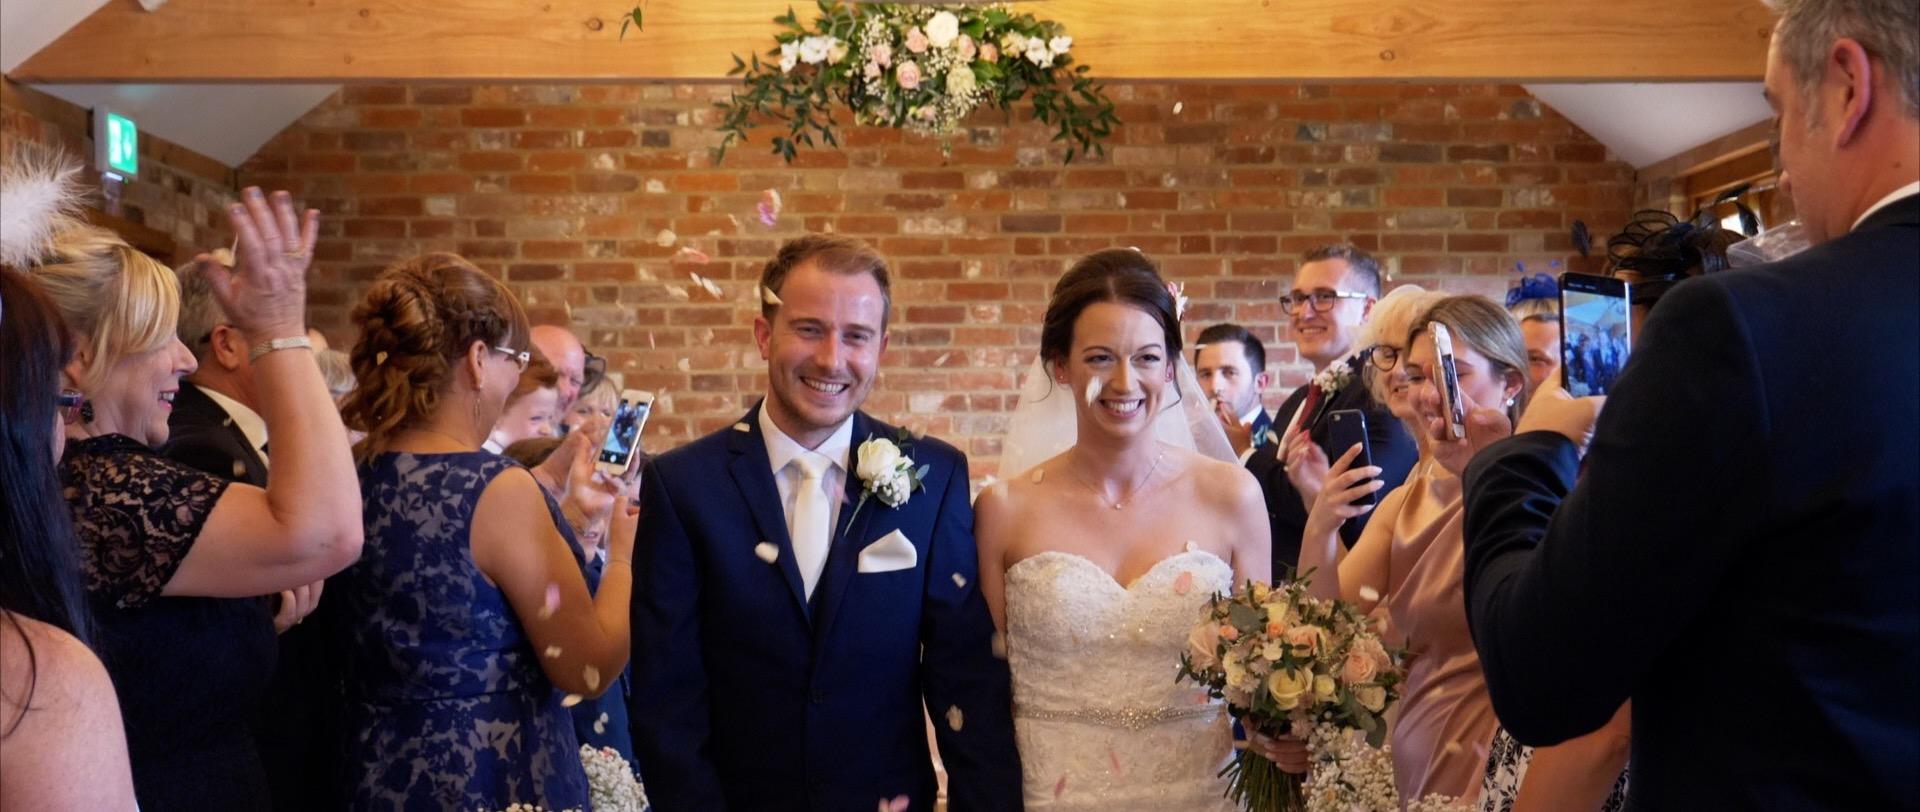 Confetti Video at Apton Hall Rochford Weddings.jpg